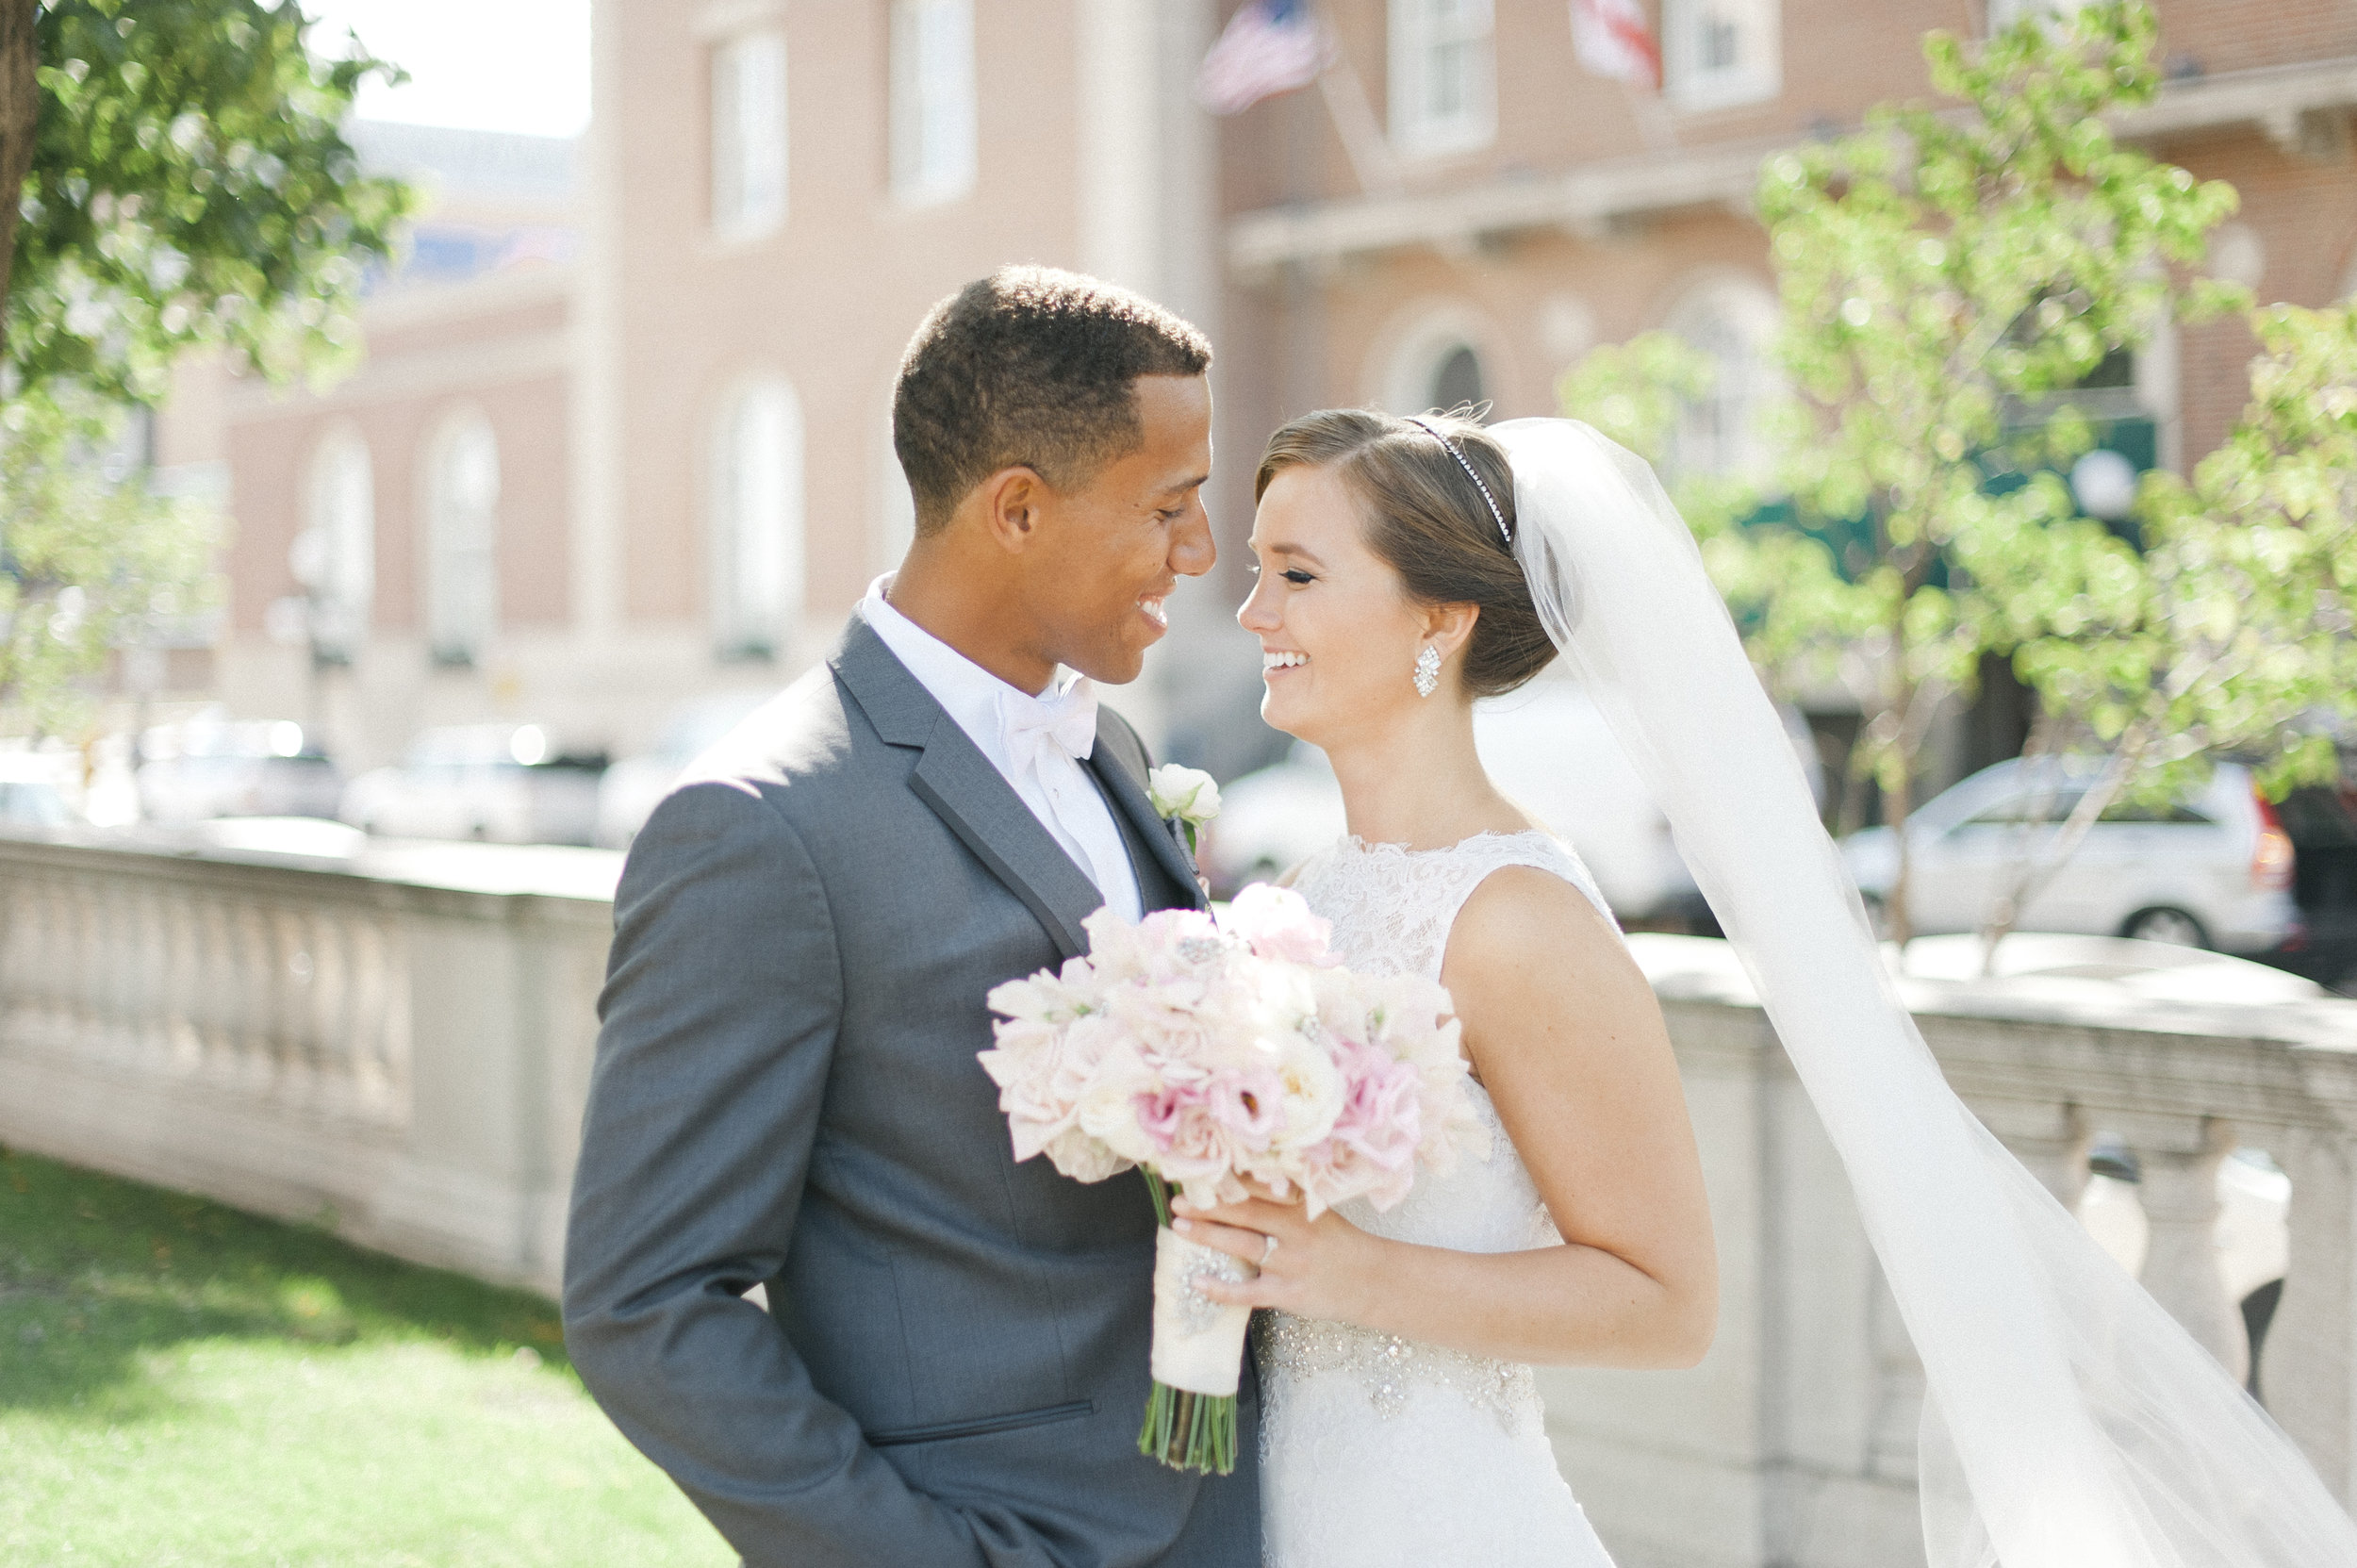 Lovell-Dillahunty Wedding_299.jpg